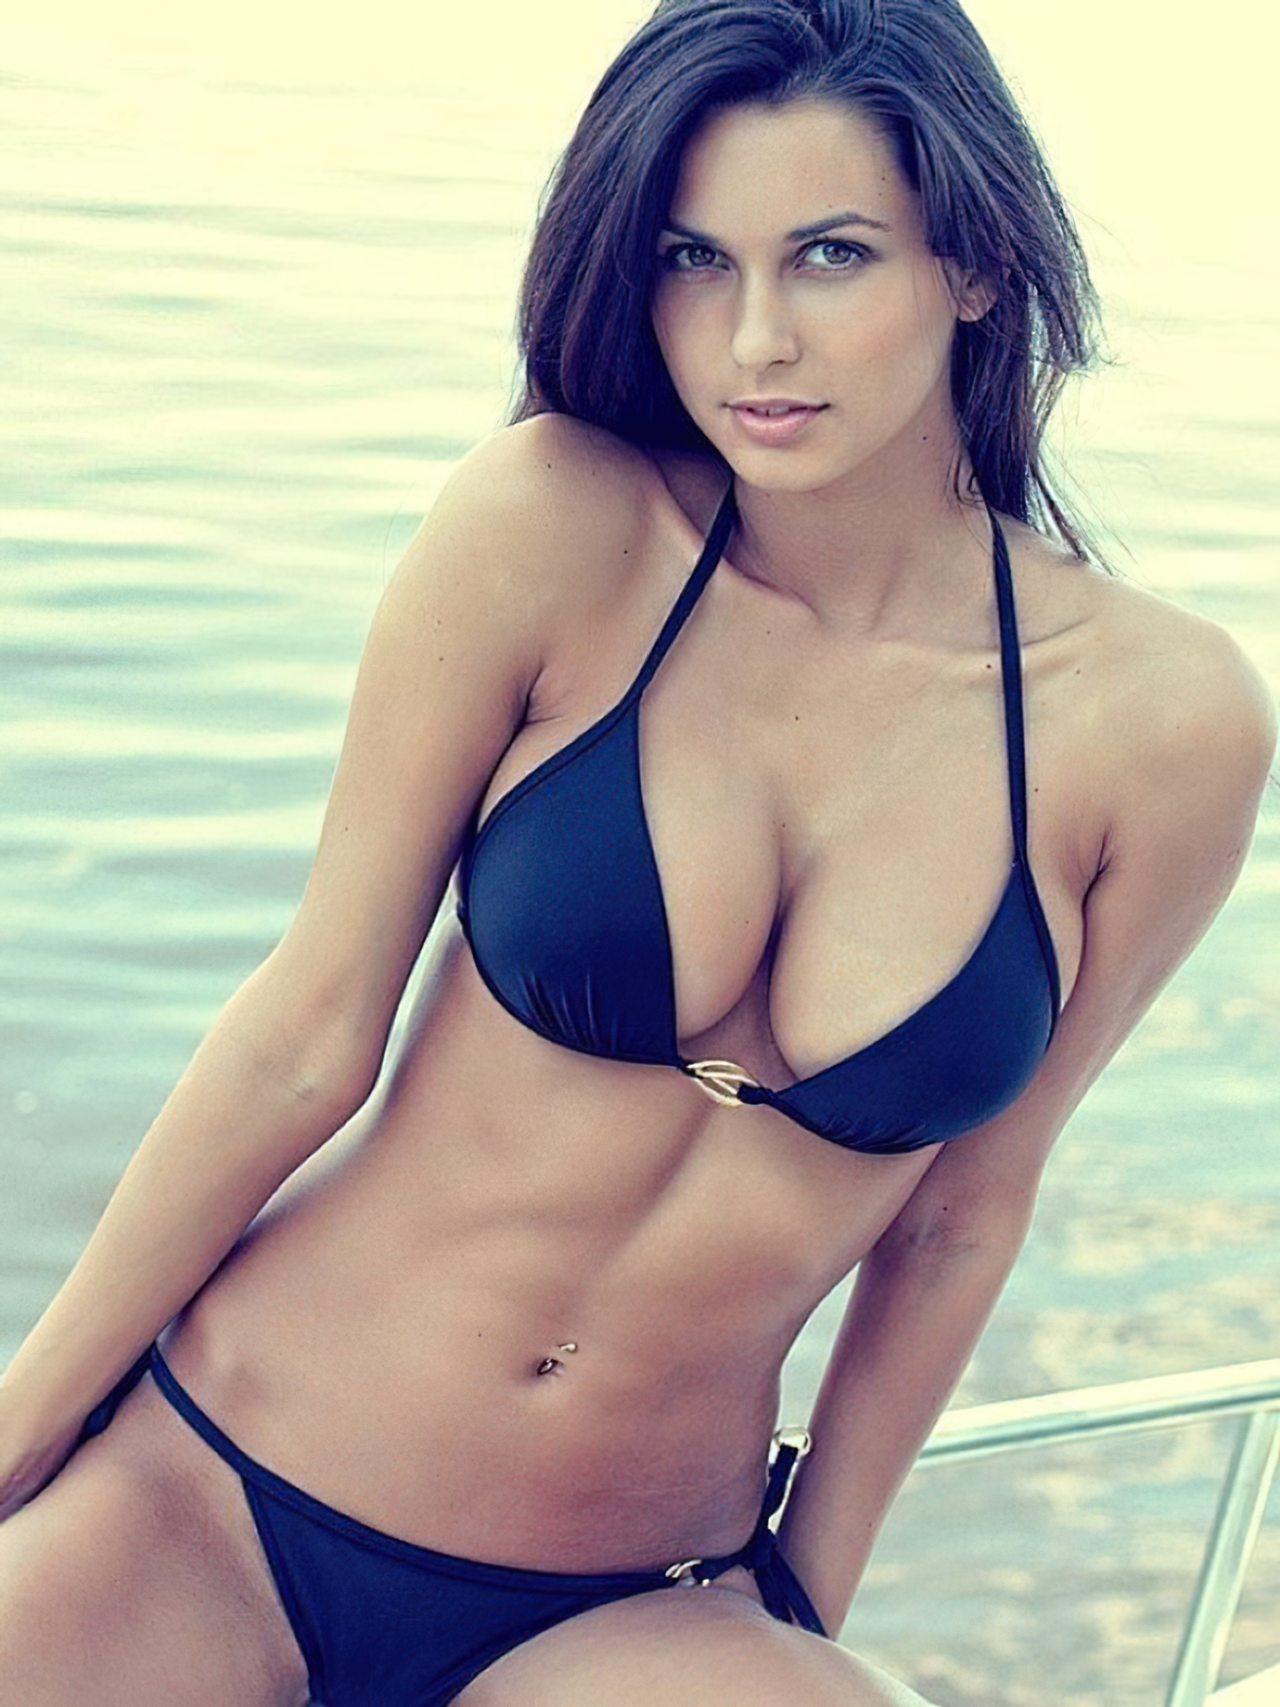 Mulher de Bikini